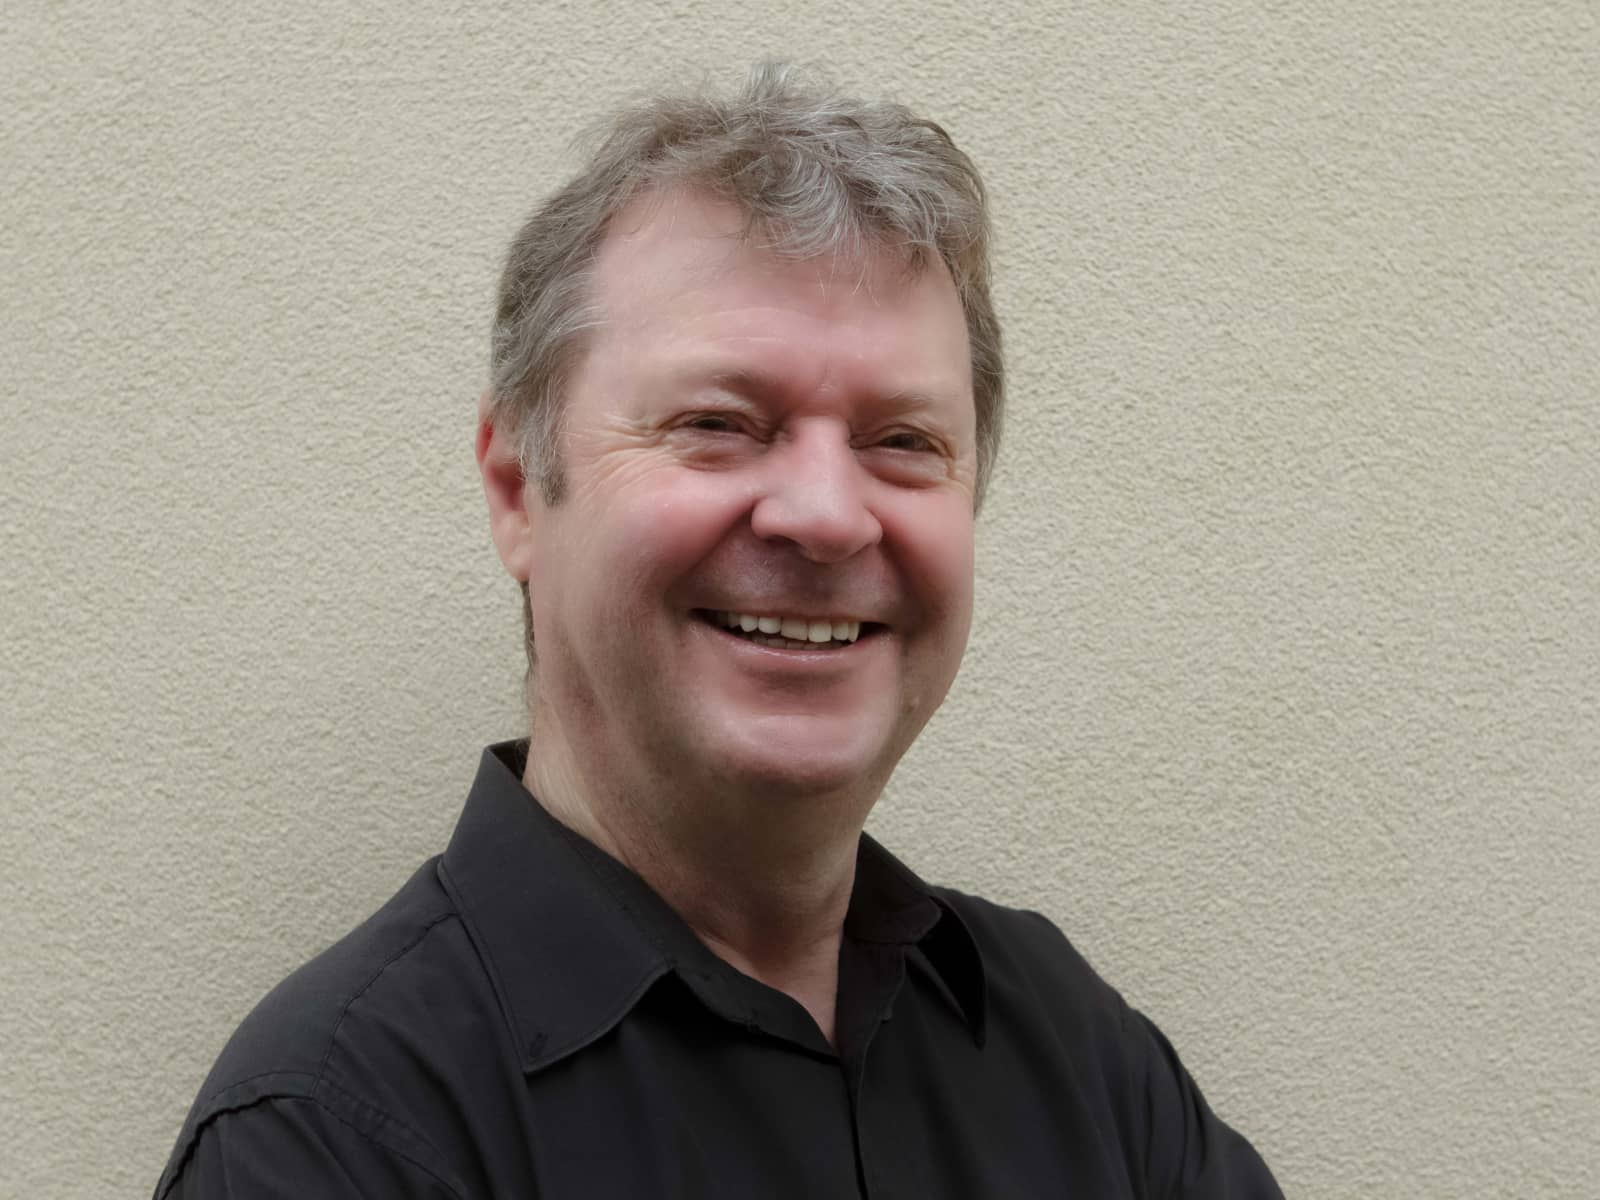 Angus from Brisbane, Queensland, Australia